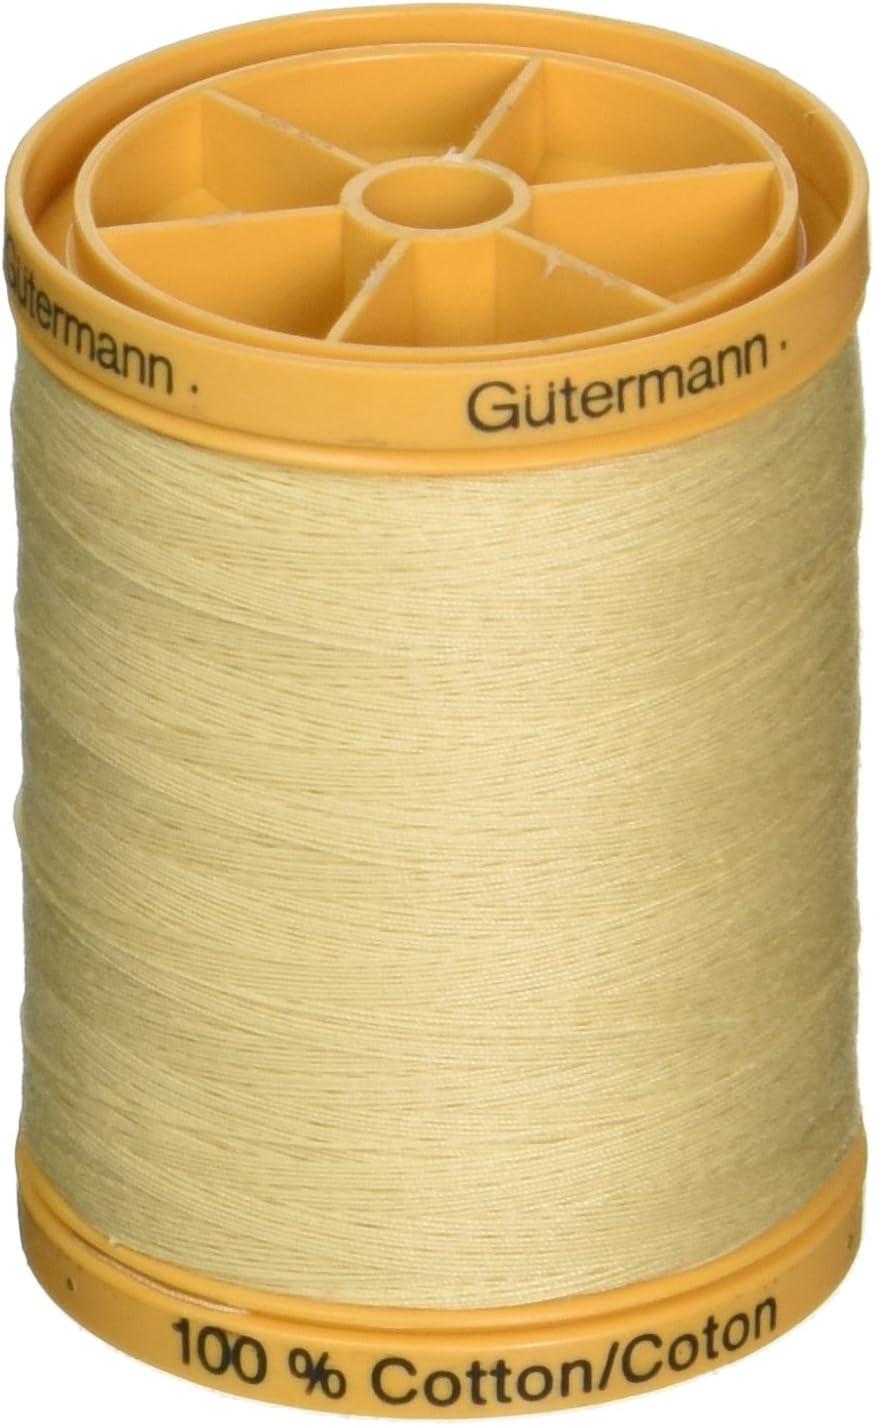 S-lidos Thread Gutermann 800C-2724 Algod-n Natural 876 Yardas-Mauve